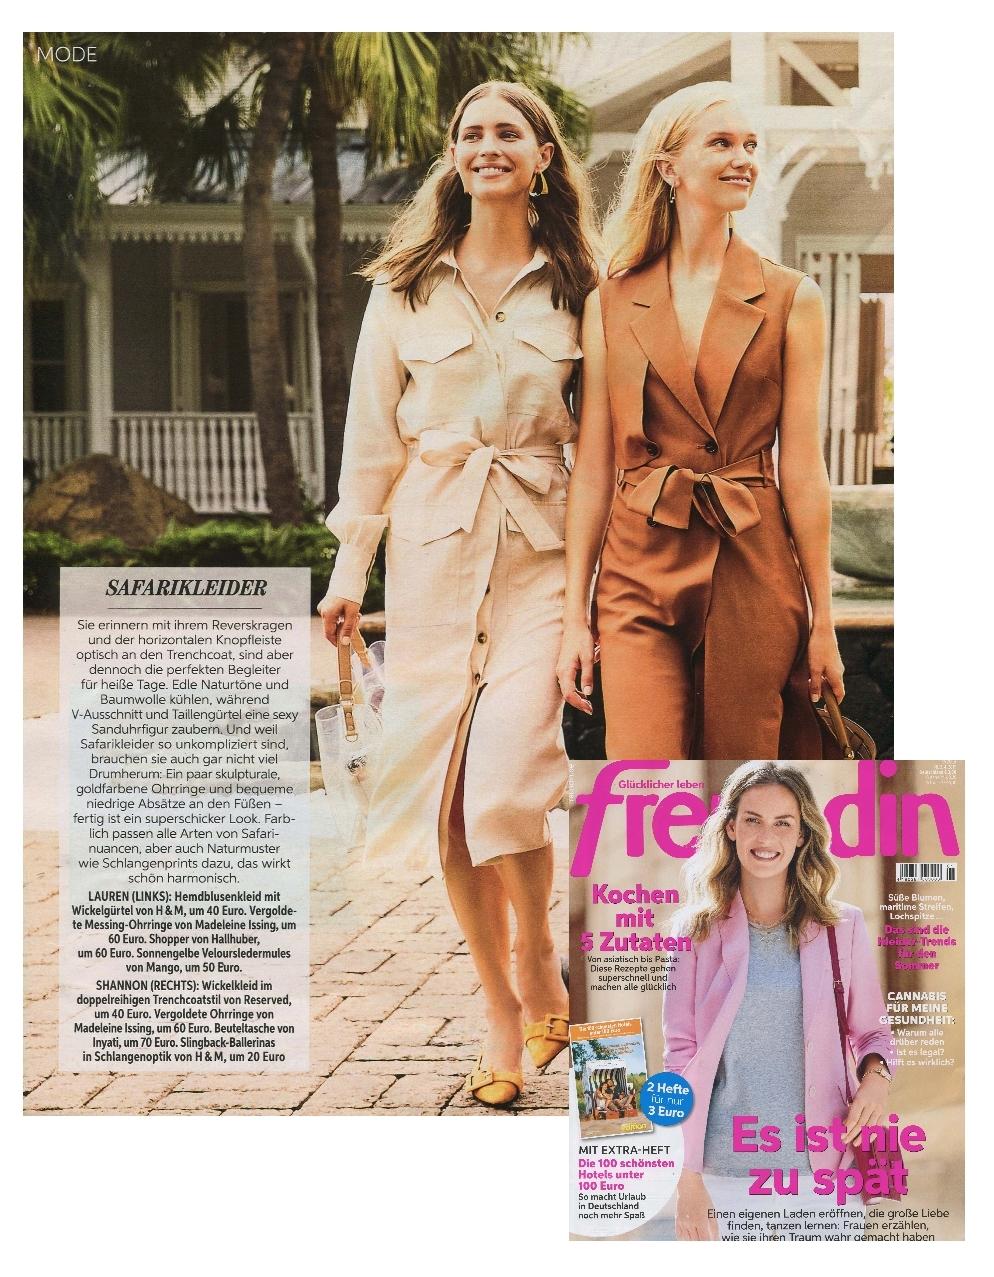 Freundin Magazin April 2019 Madeleine Issing